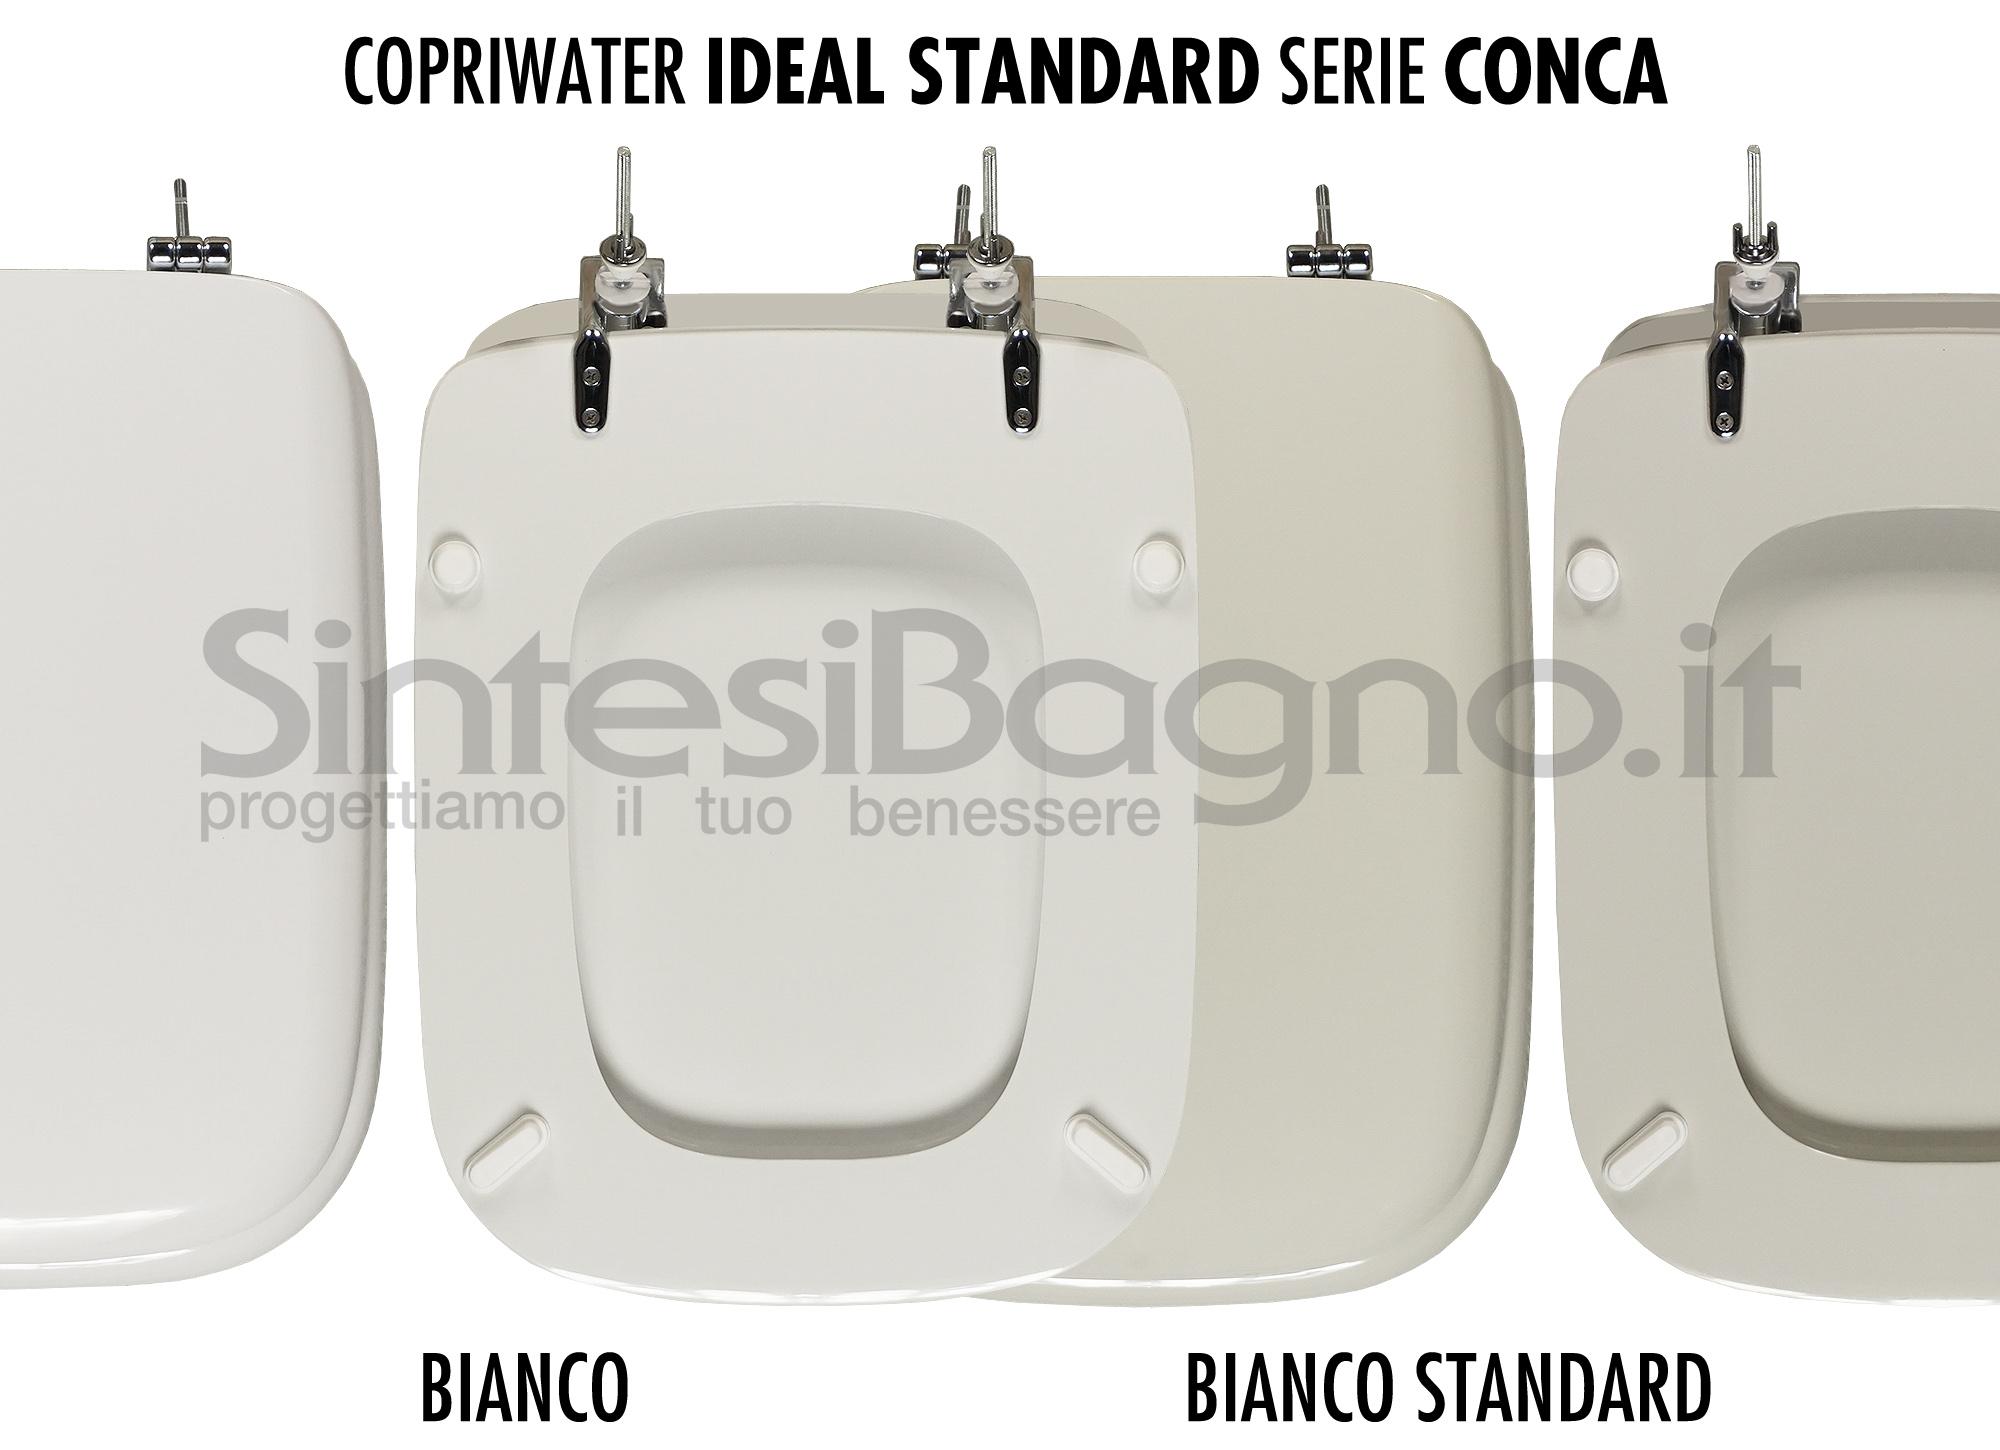 Sedile Tesi Ideal Standard Bianco Europa.Copriwater Ideal Standard Colore Bianco O Bianco Standard Dettaglio Notizia Sintesibagno Shop